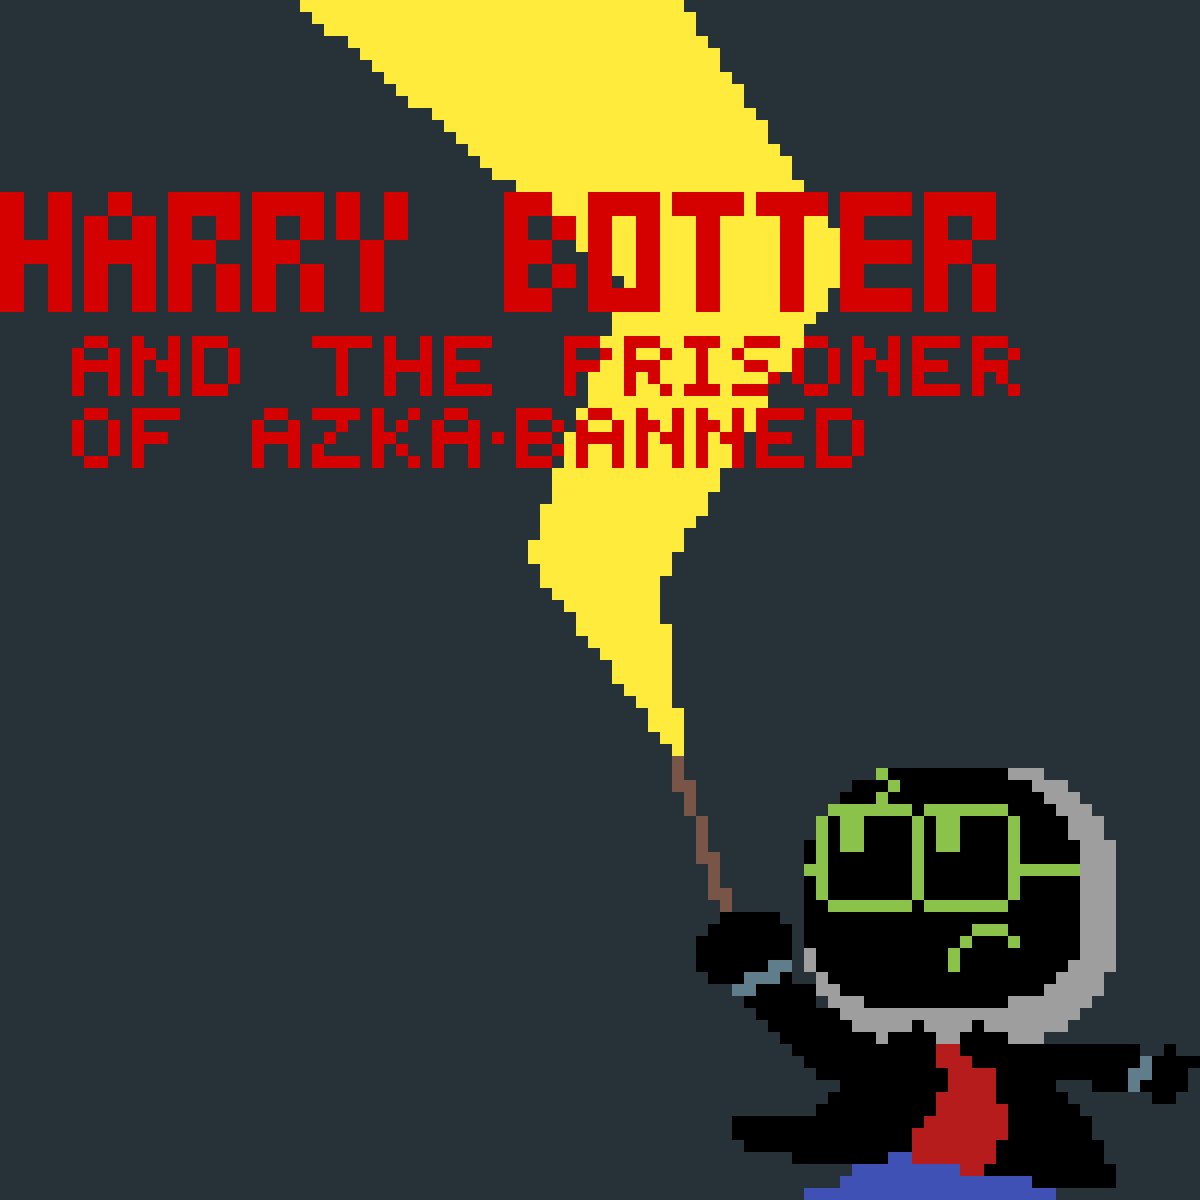 Harry Botter and the Prisoner of Azka-Banned by Pixelkiddo